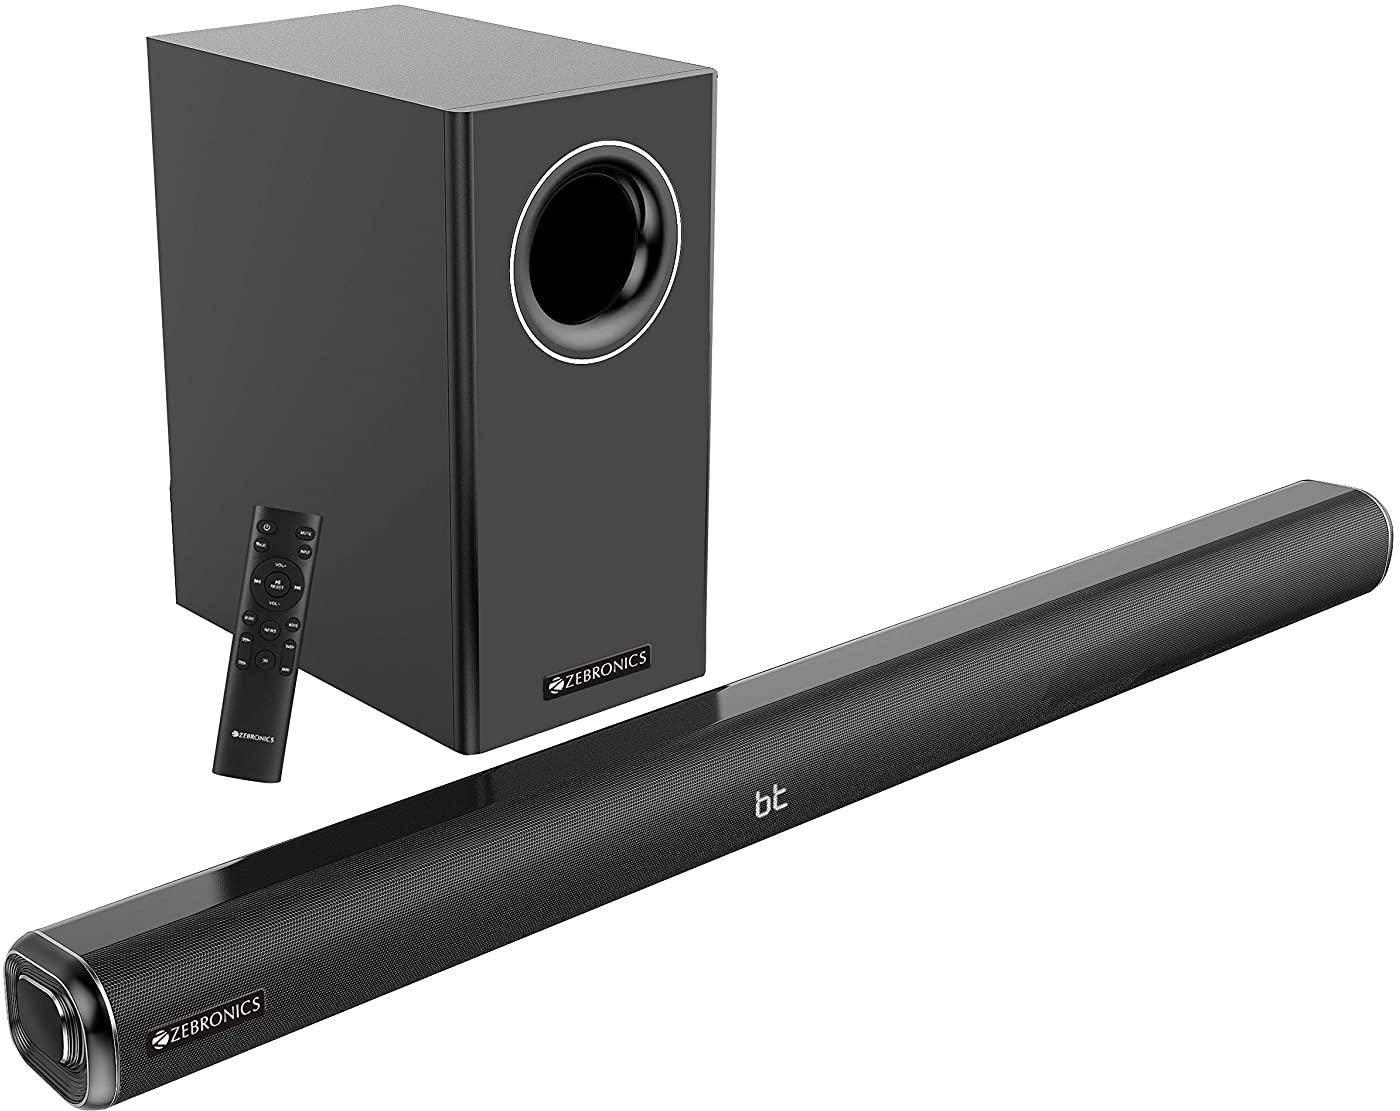 Zebronics Zeb-JUKEBAR 6000DWS PRO, 160W Multimedia soundbar with Wireless subwoofer zoom image